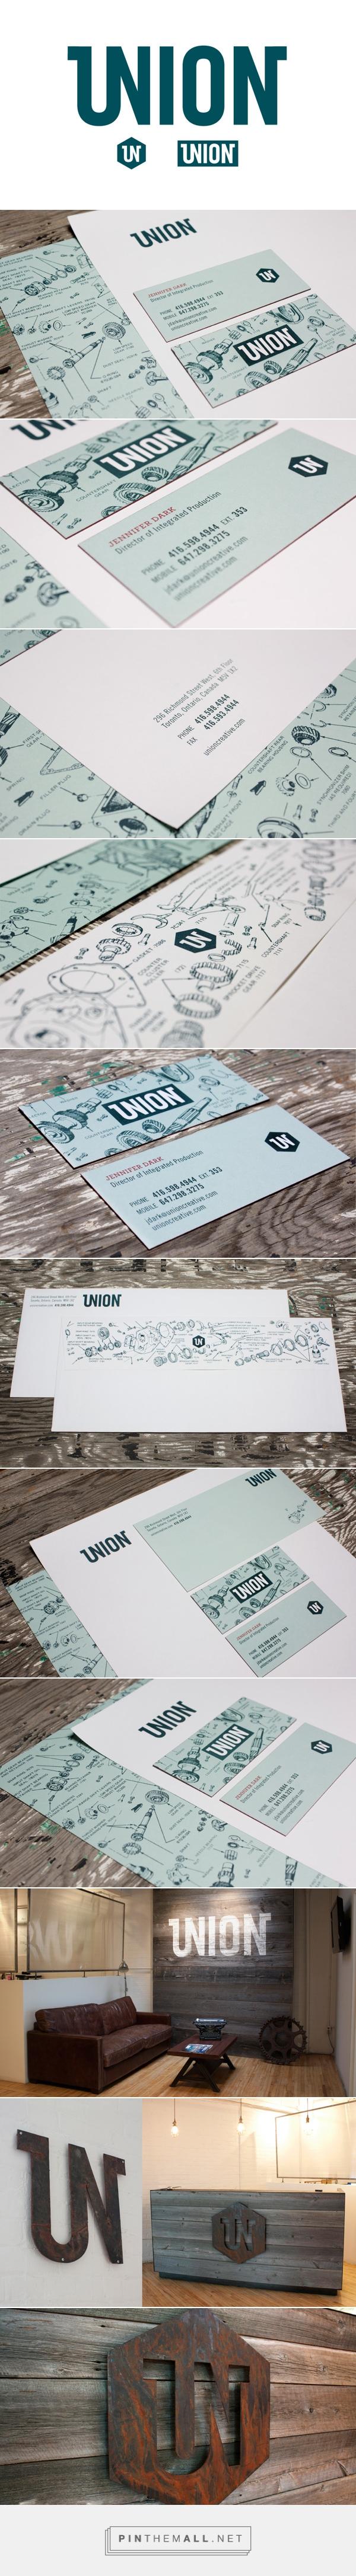 Union branding